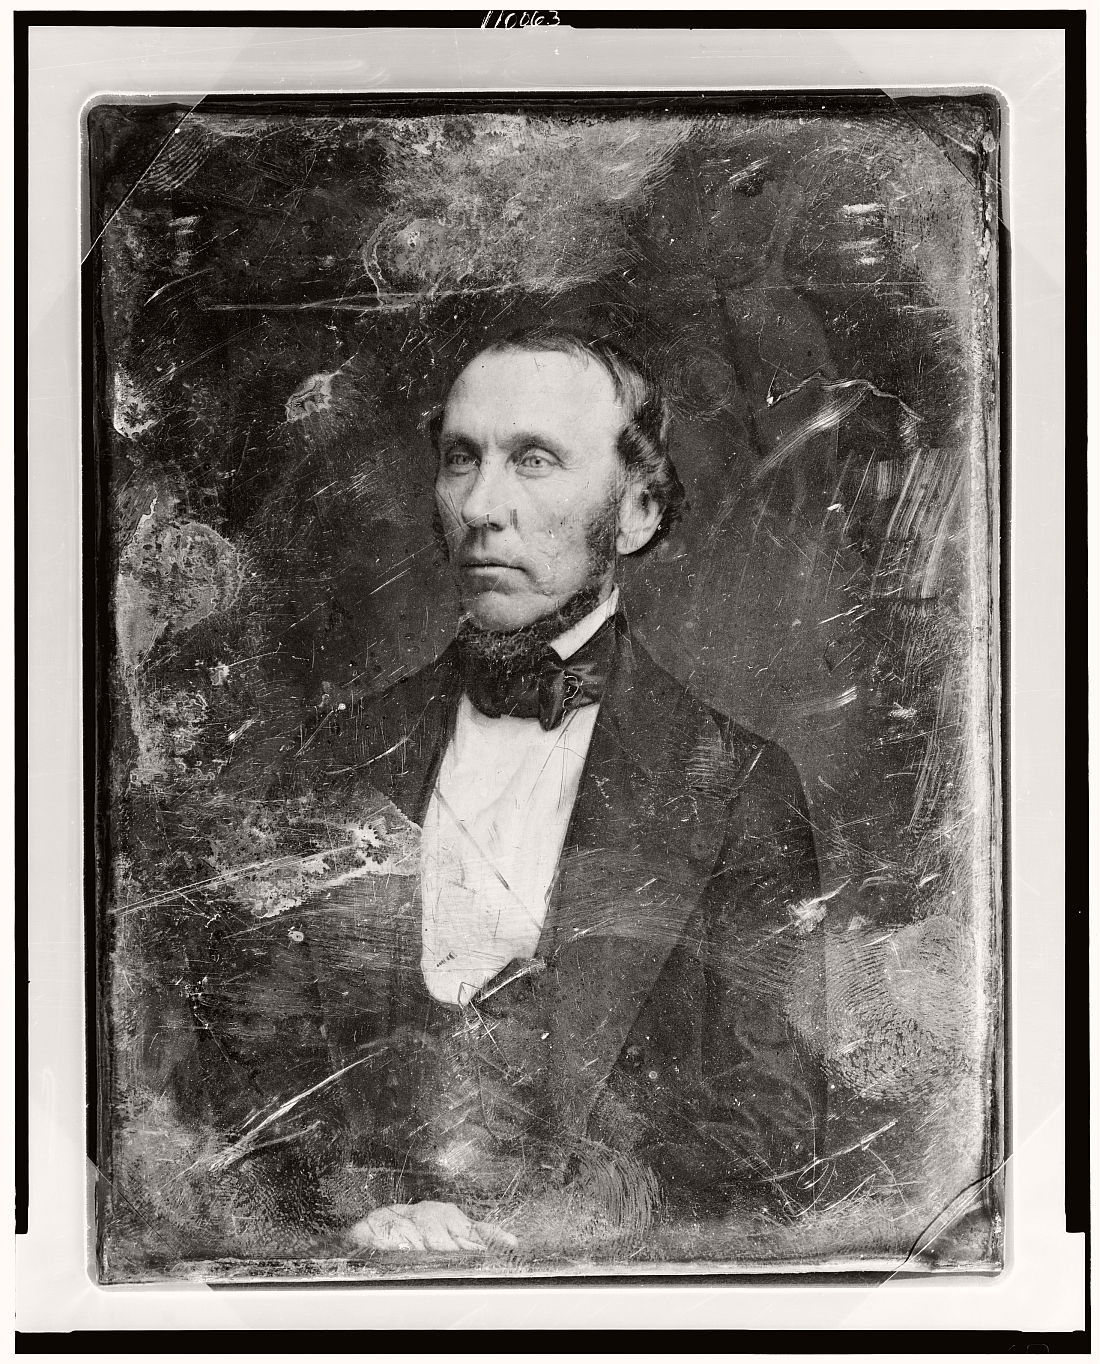 vintage-daguerreotype-portraits-from-xix-century-1844-1860-53